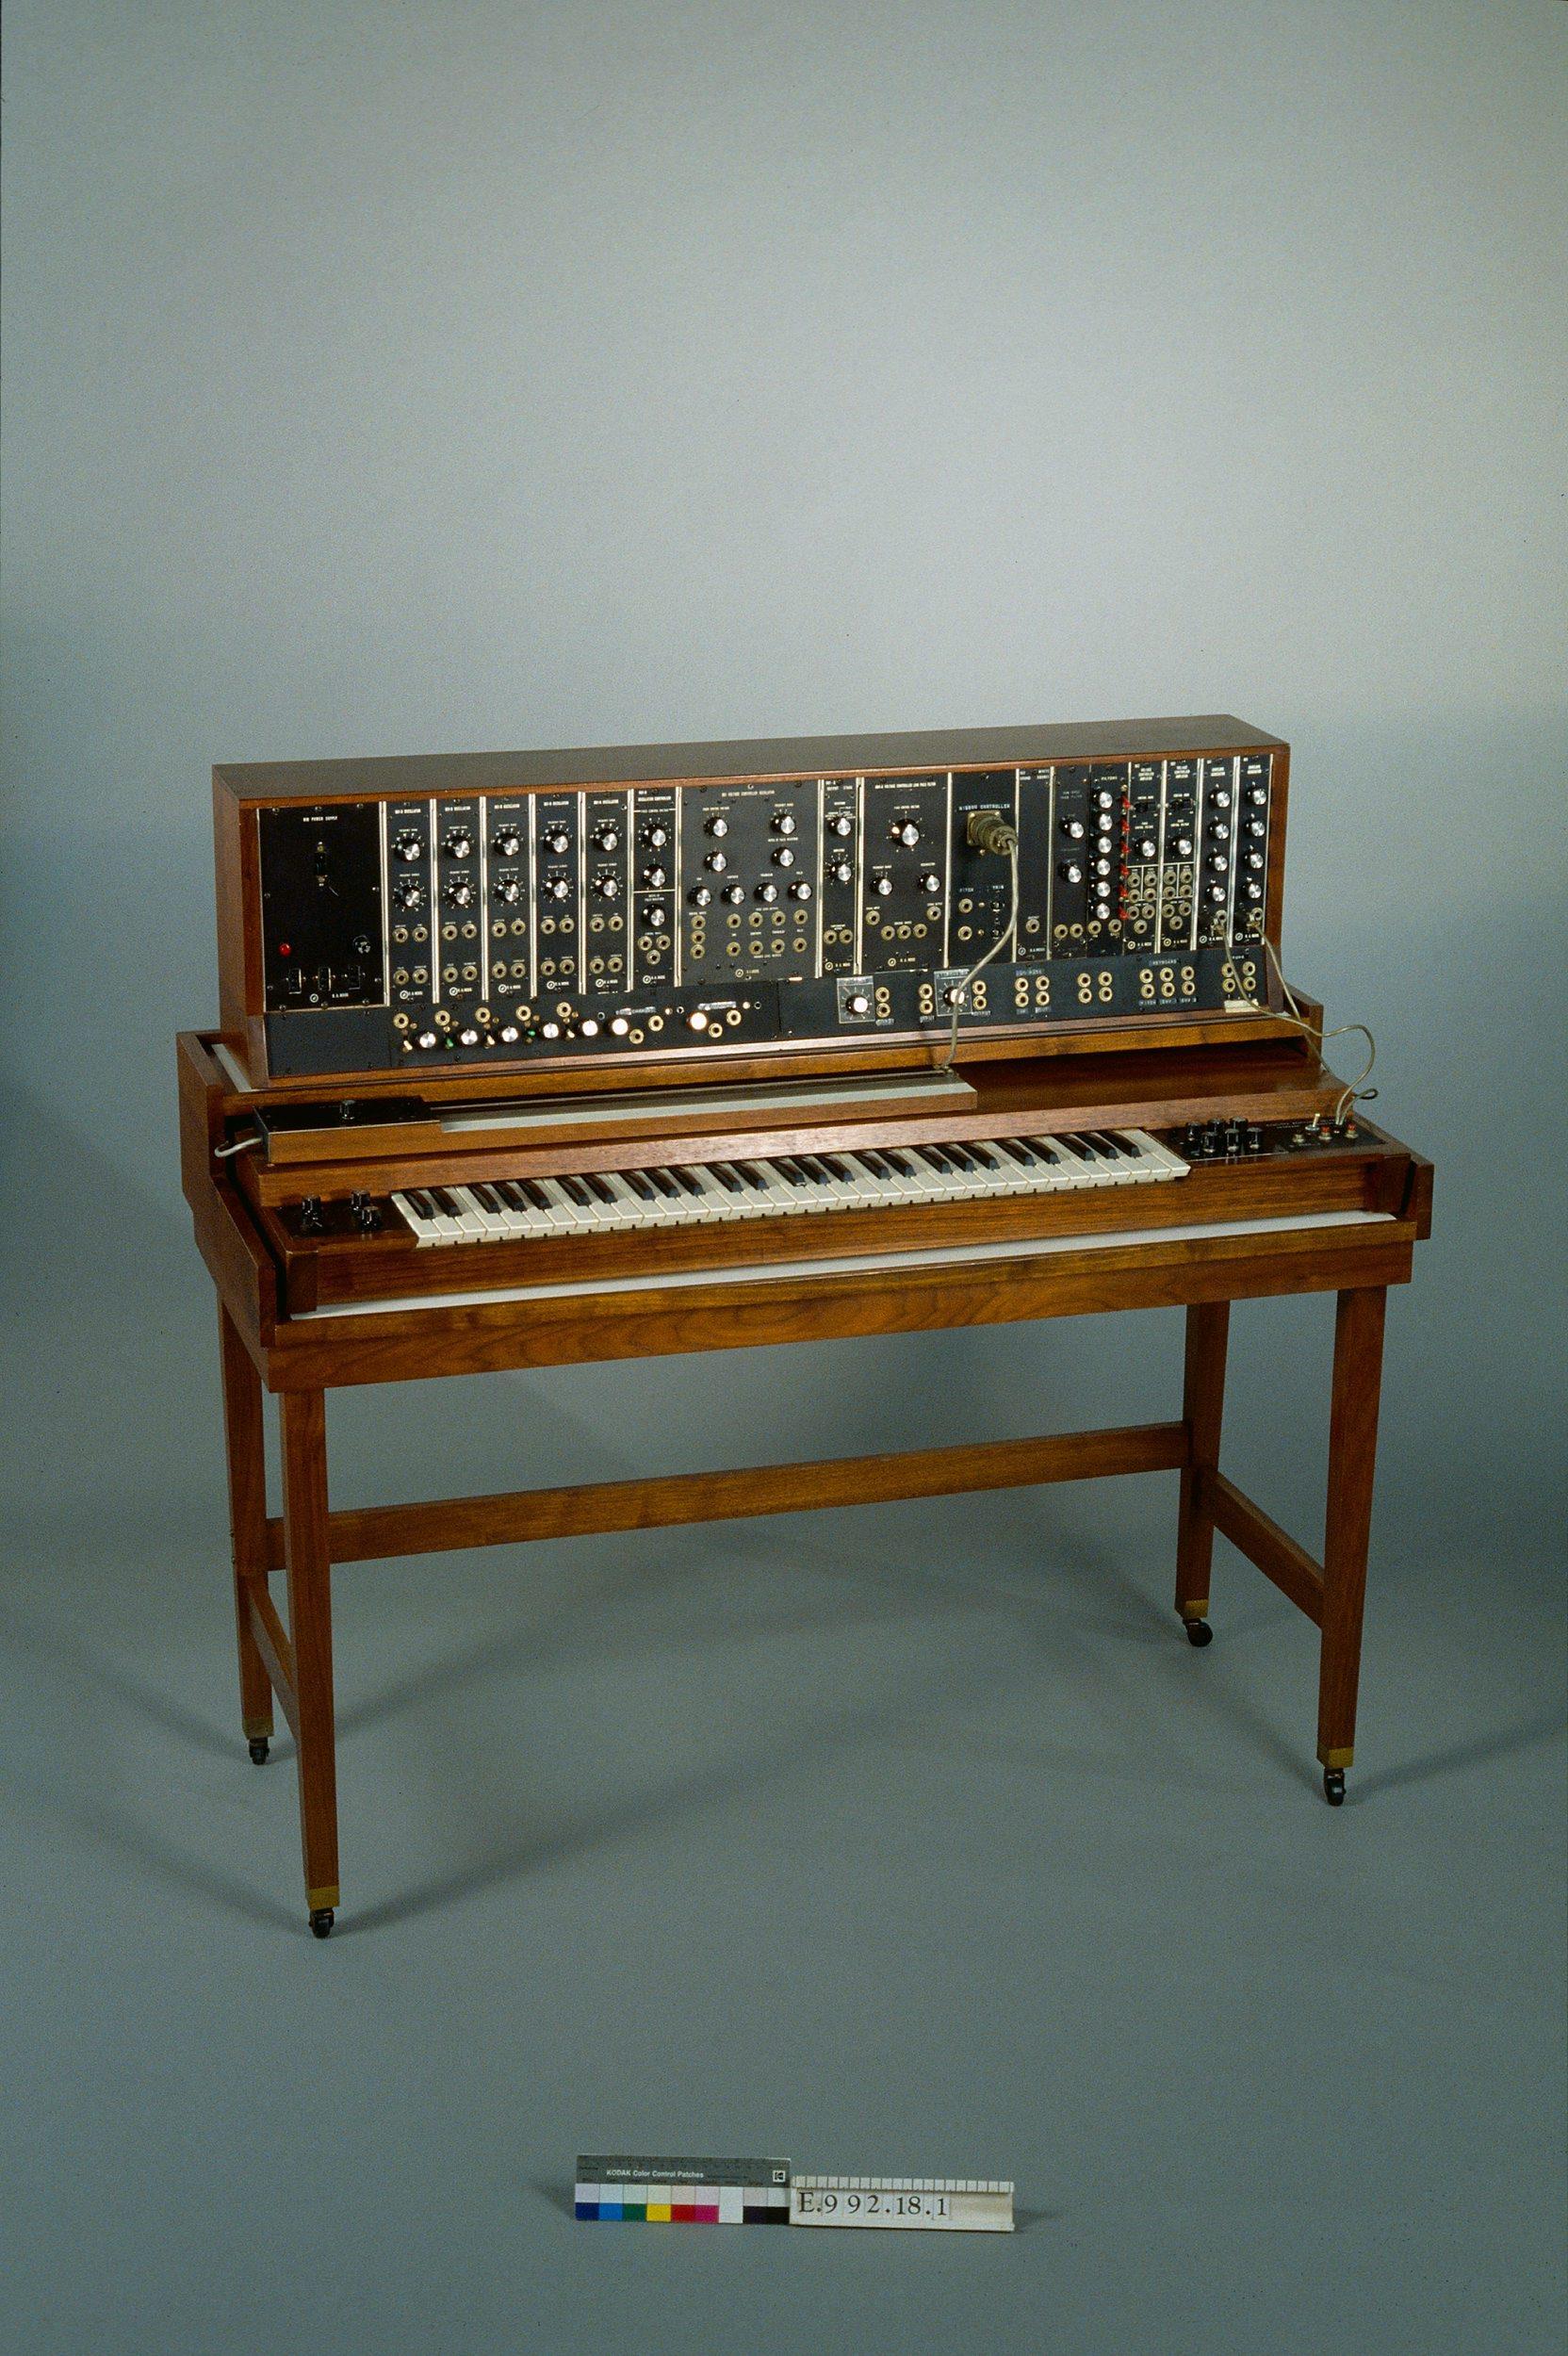 Synthétiseur modulaire | Robert Arthur Moog